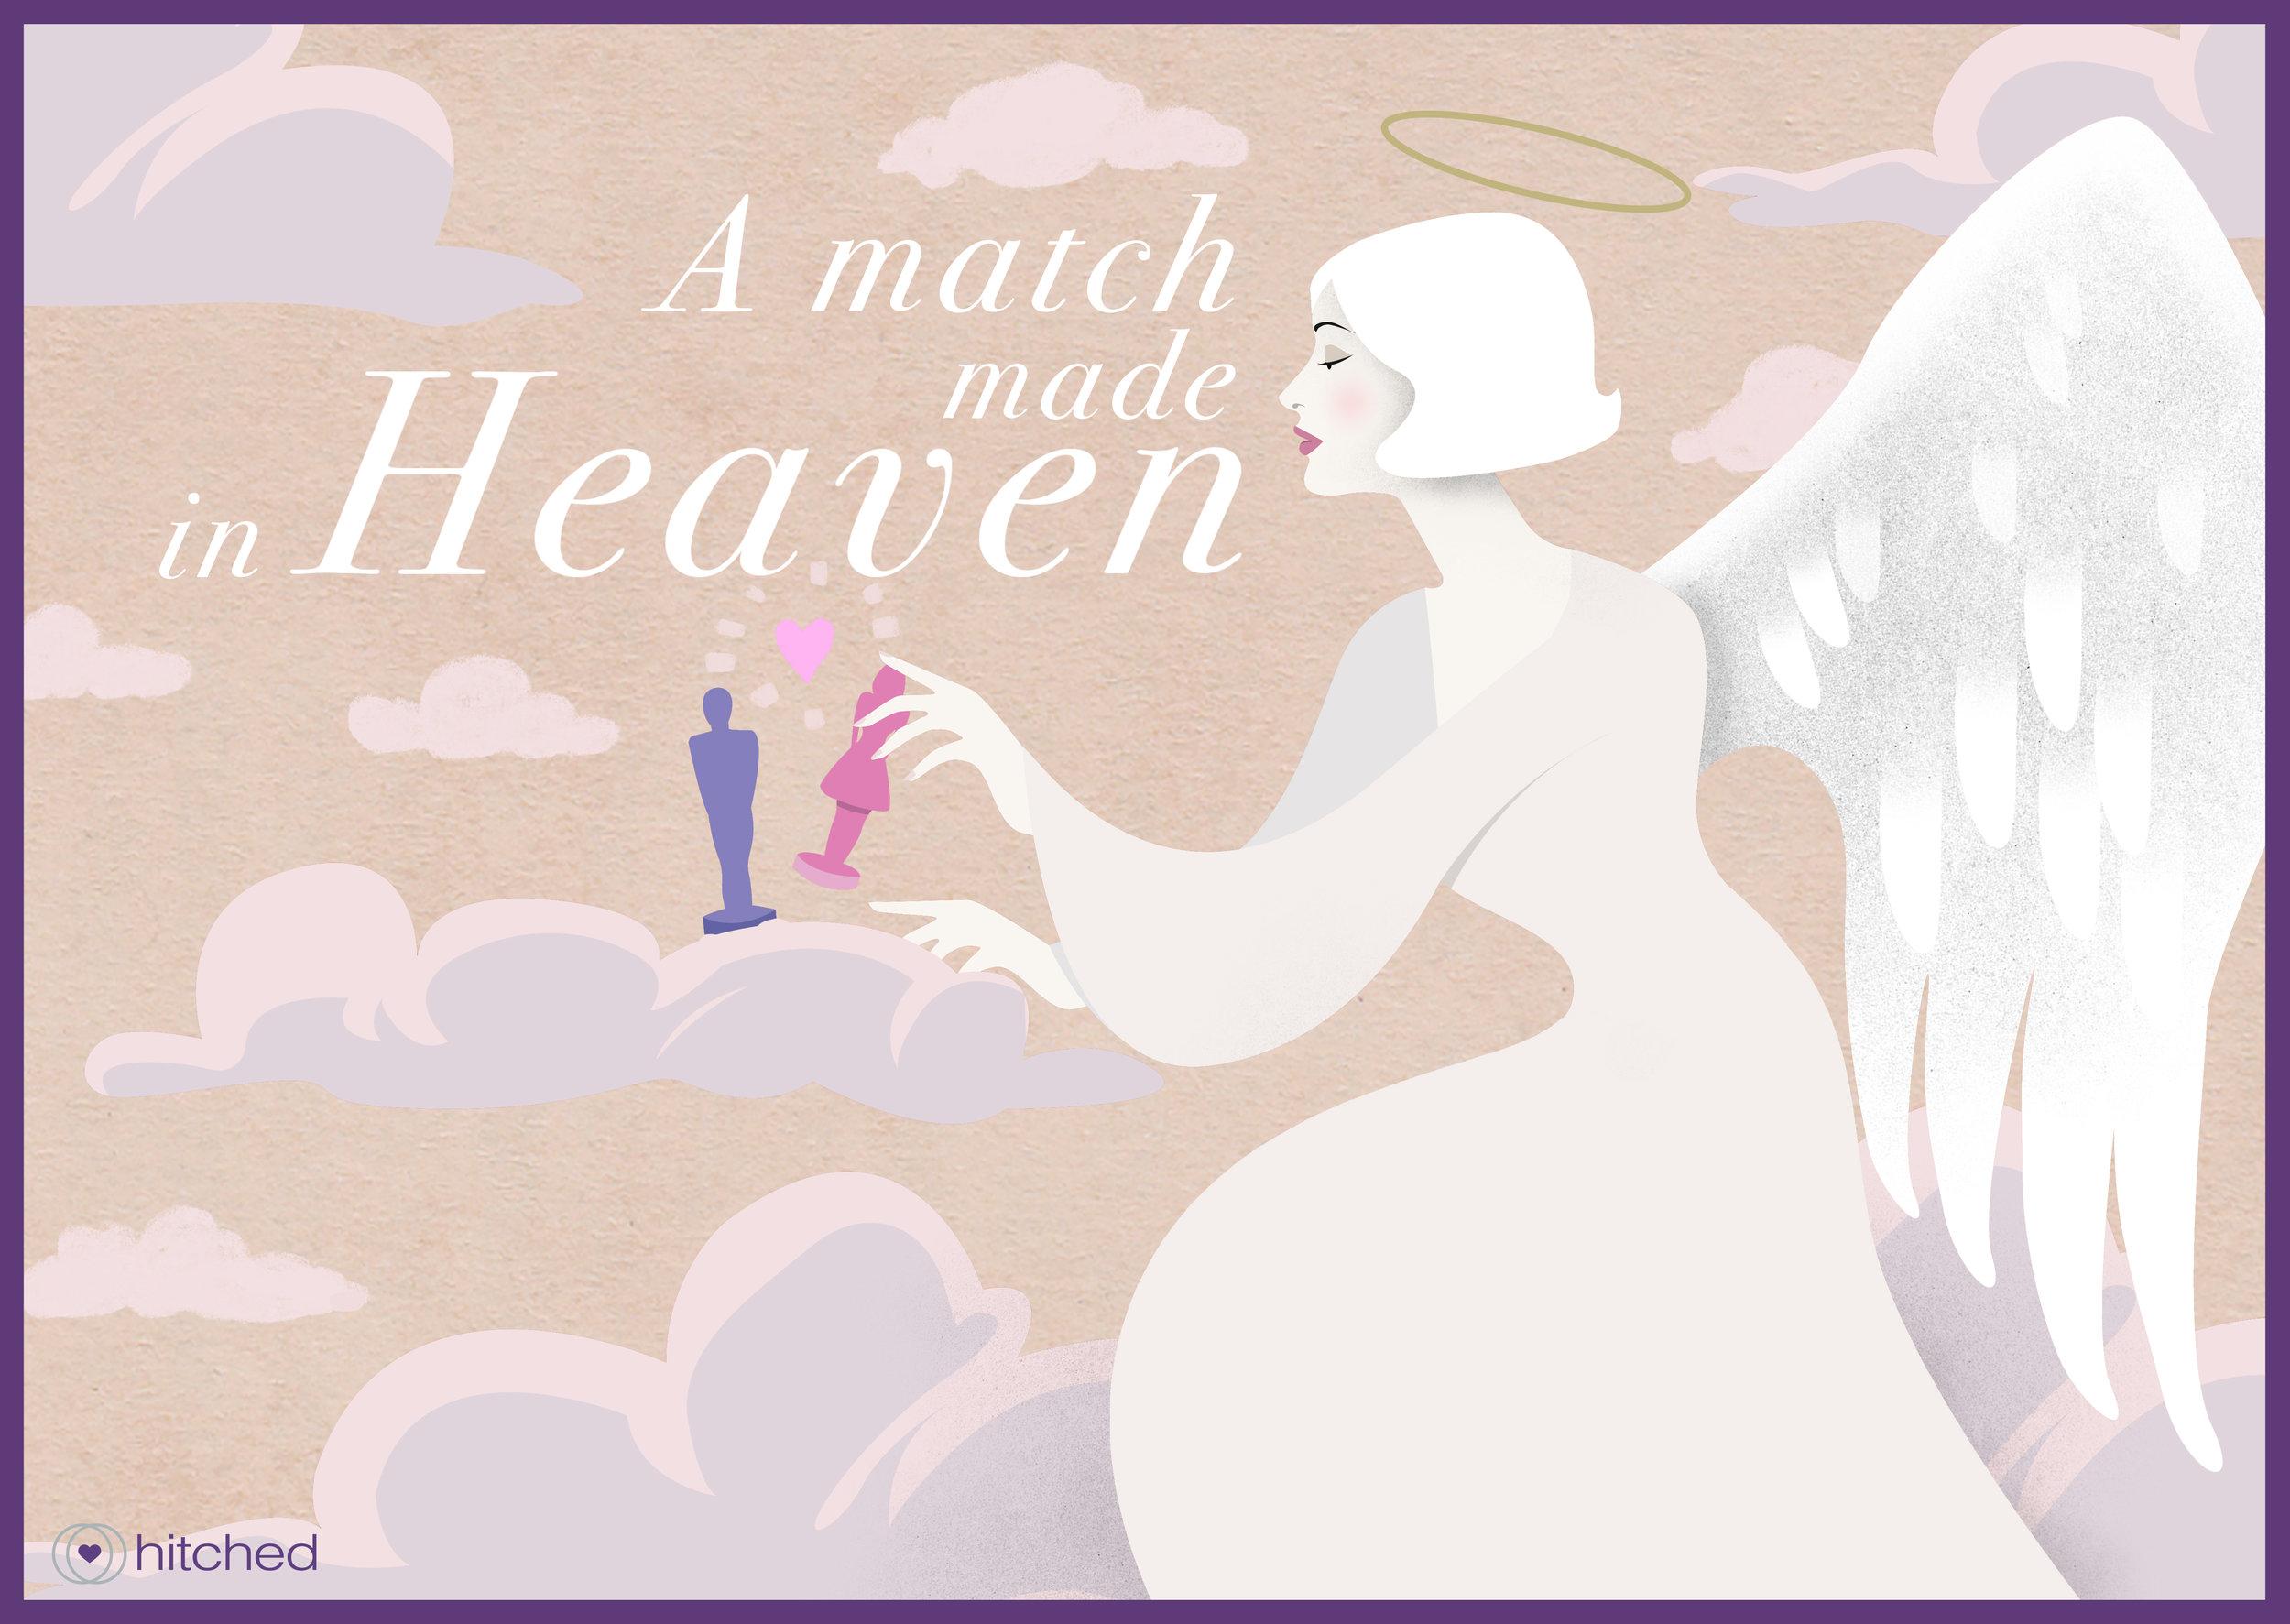 A match made in heaven.jpg